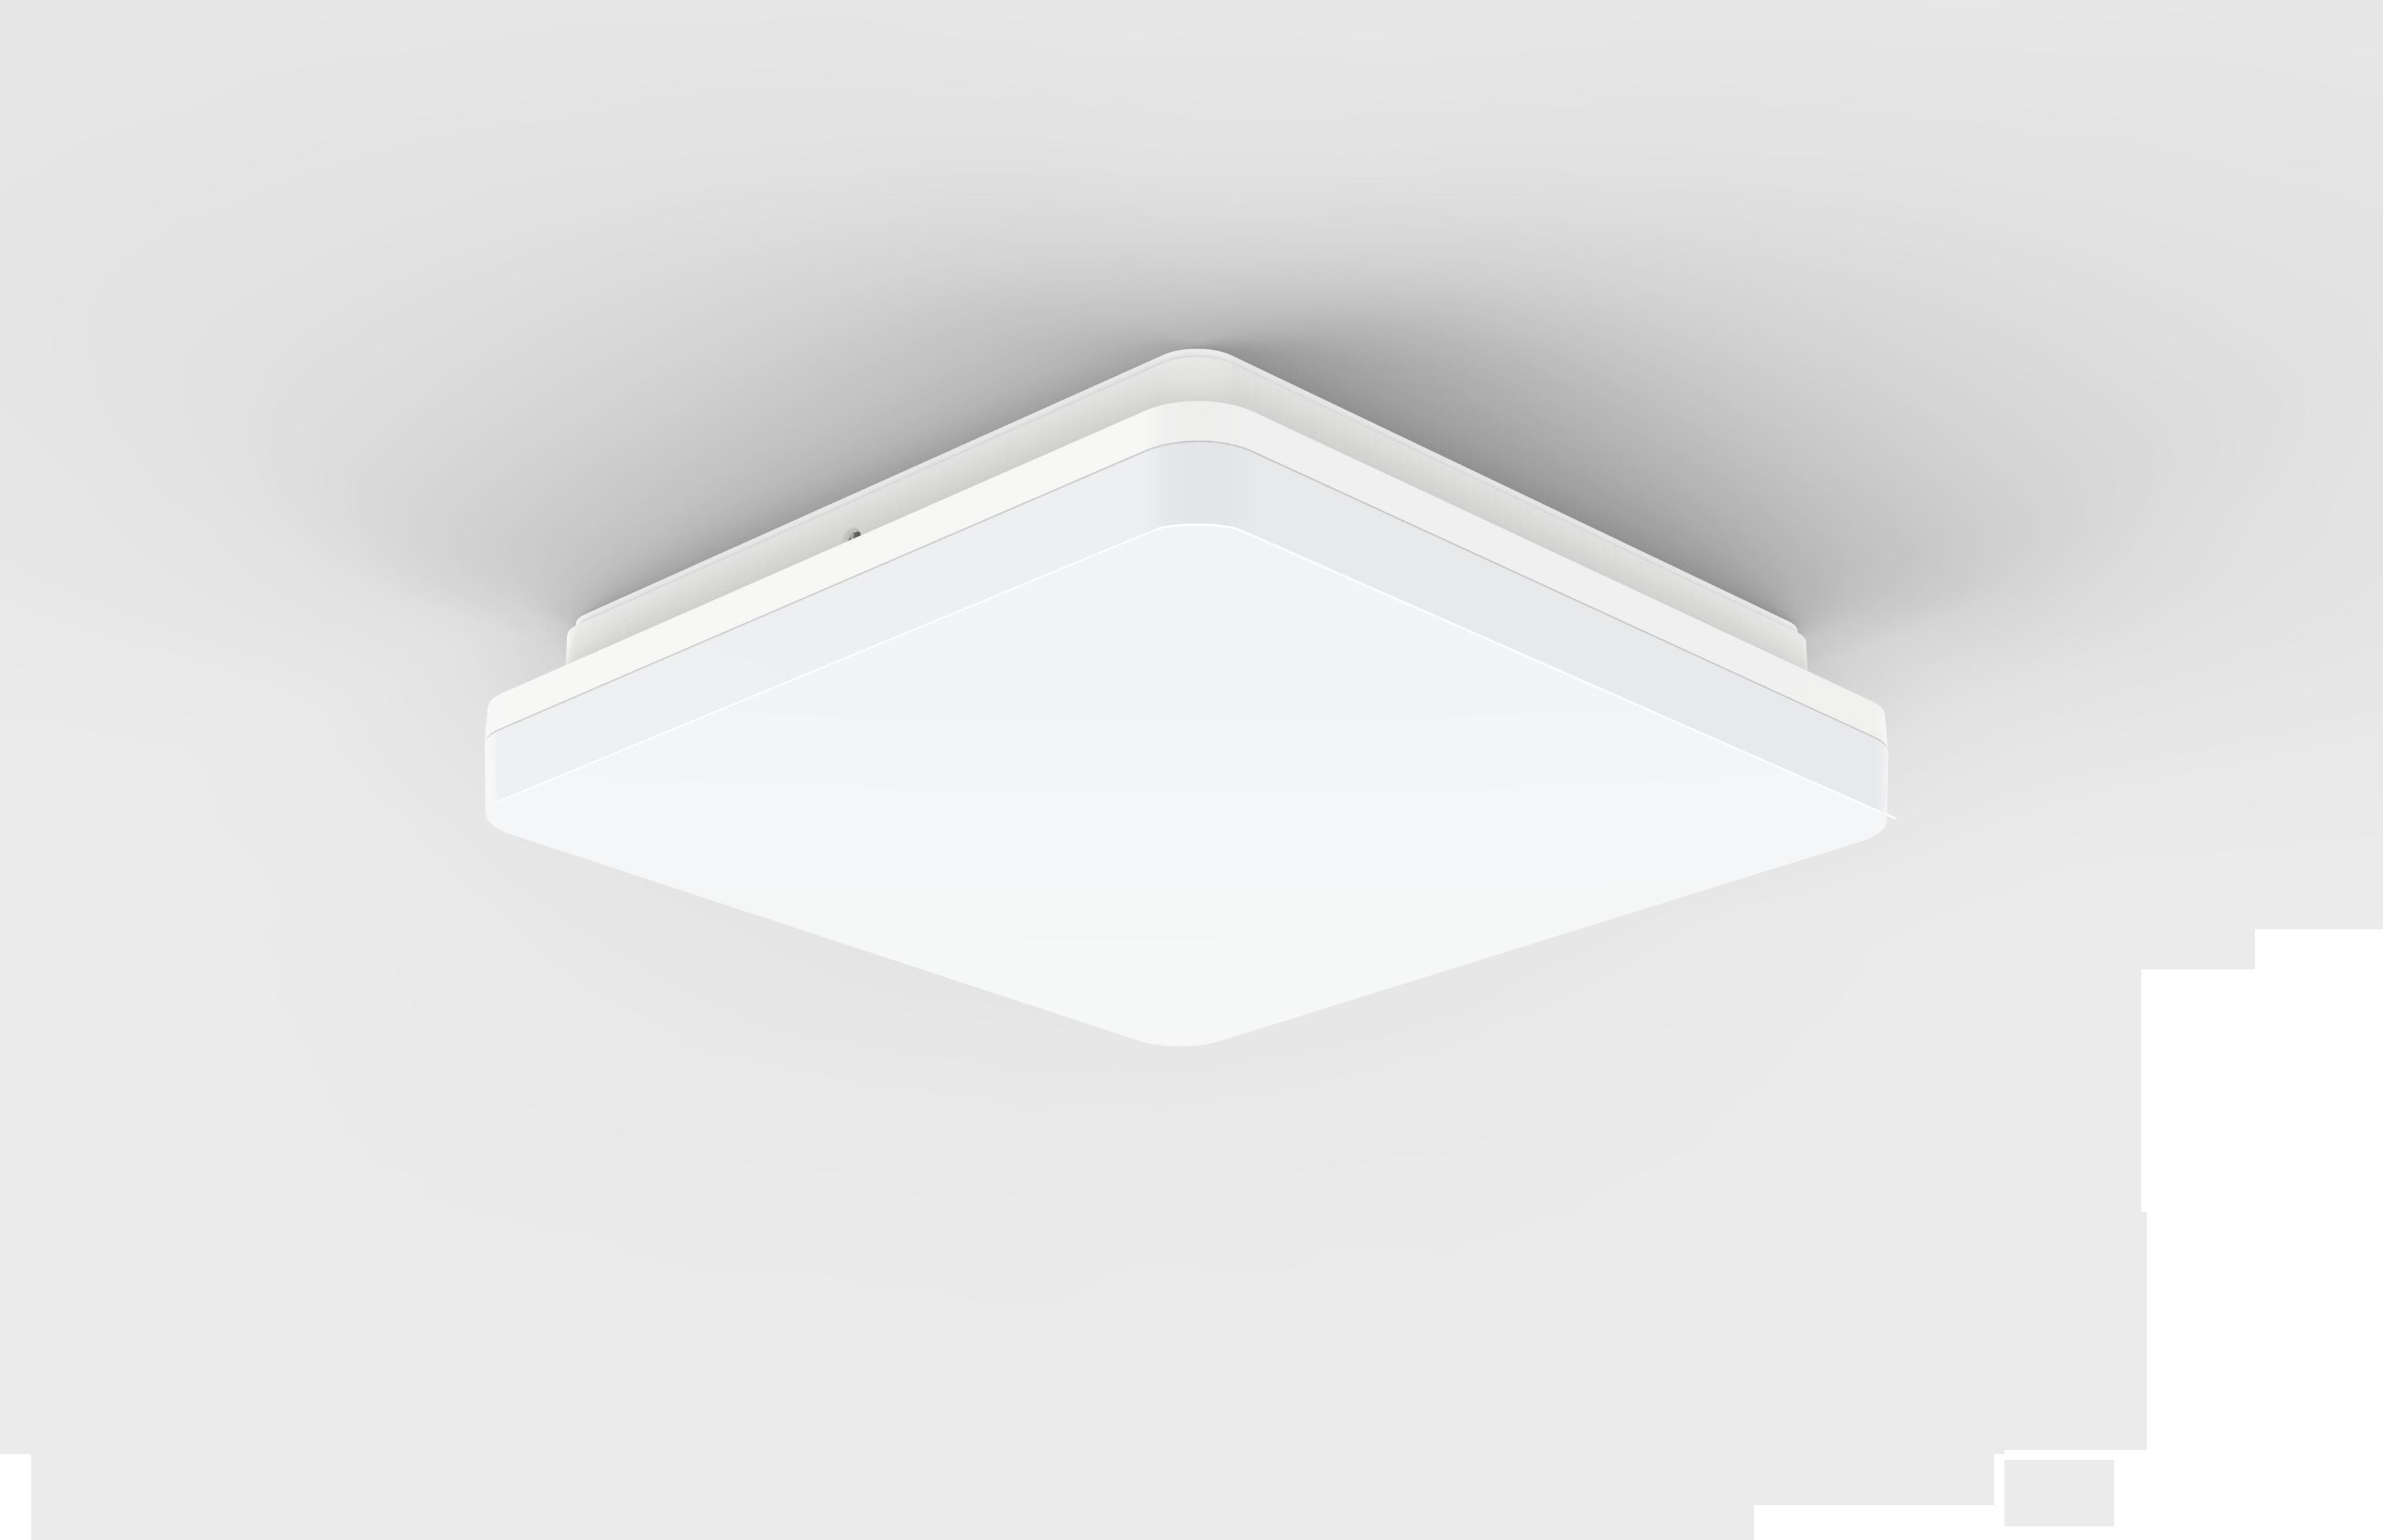 LED plafond-/wandverlichting Rijn Vierkant